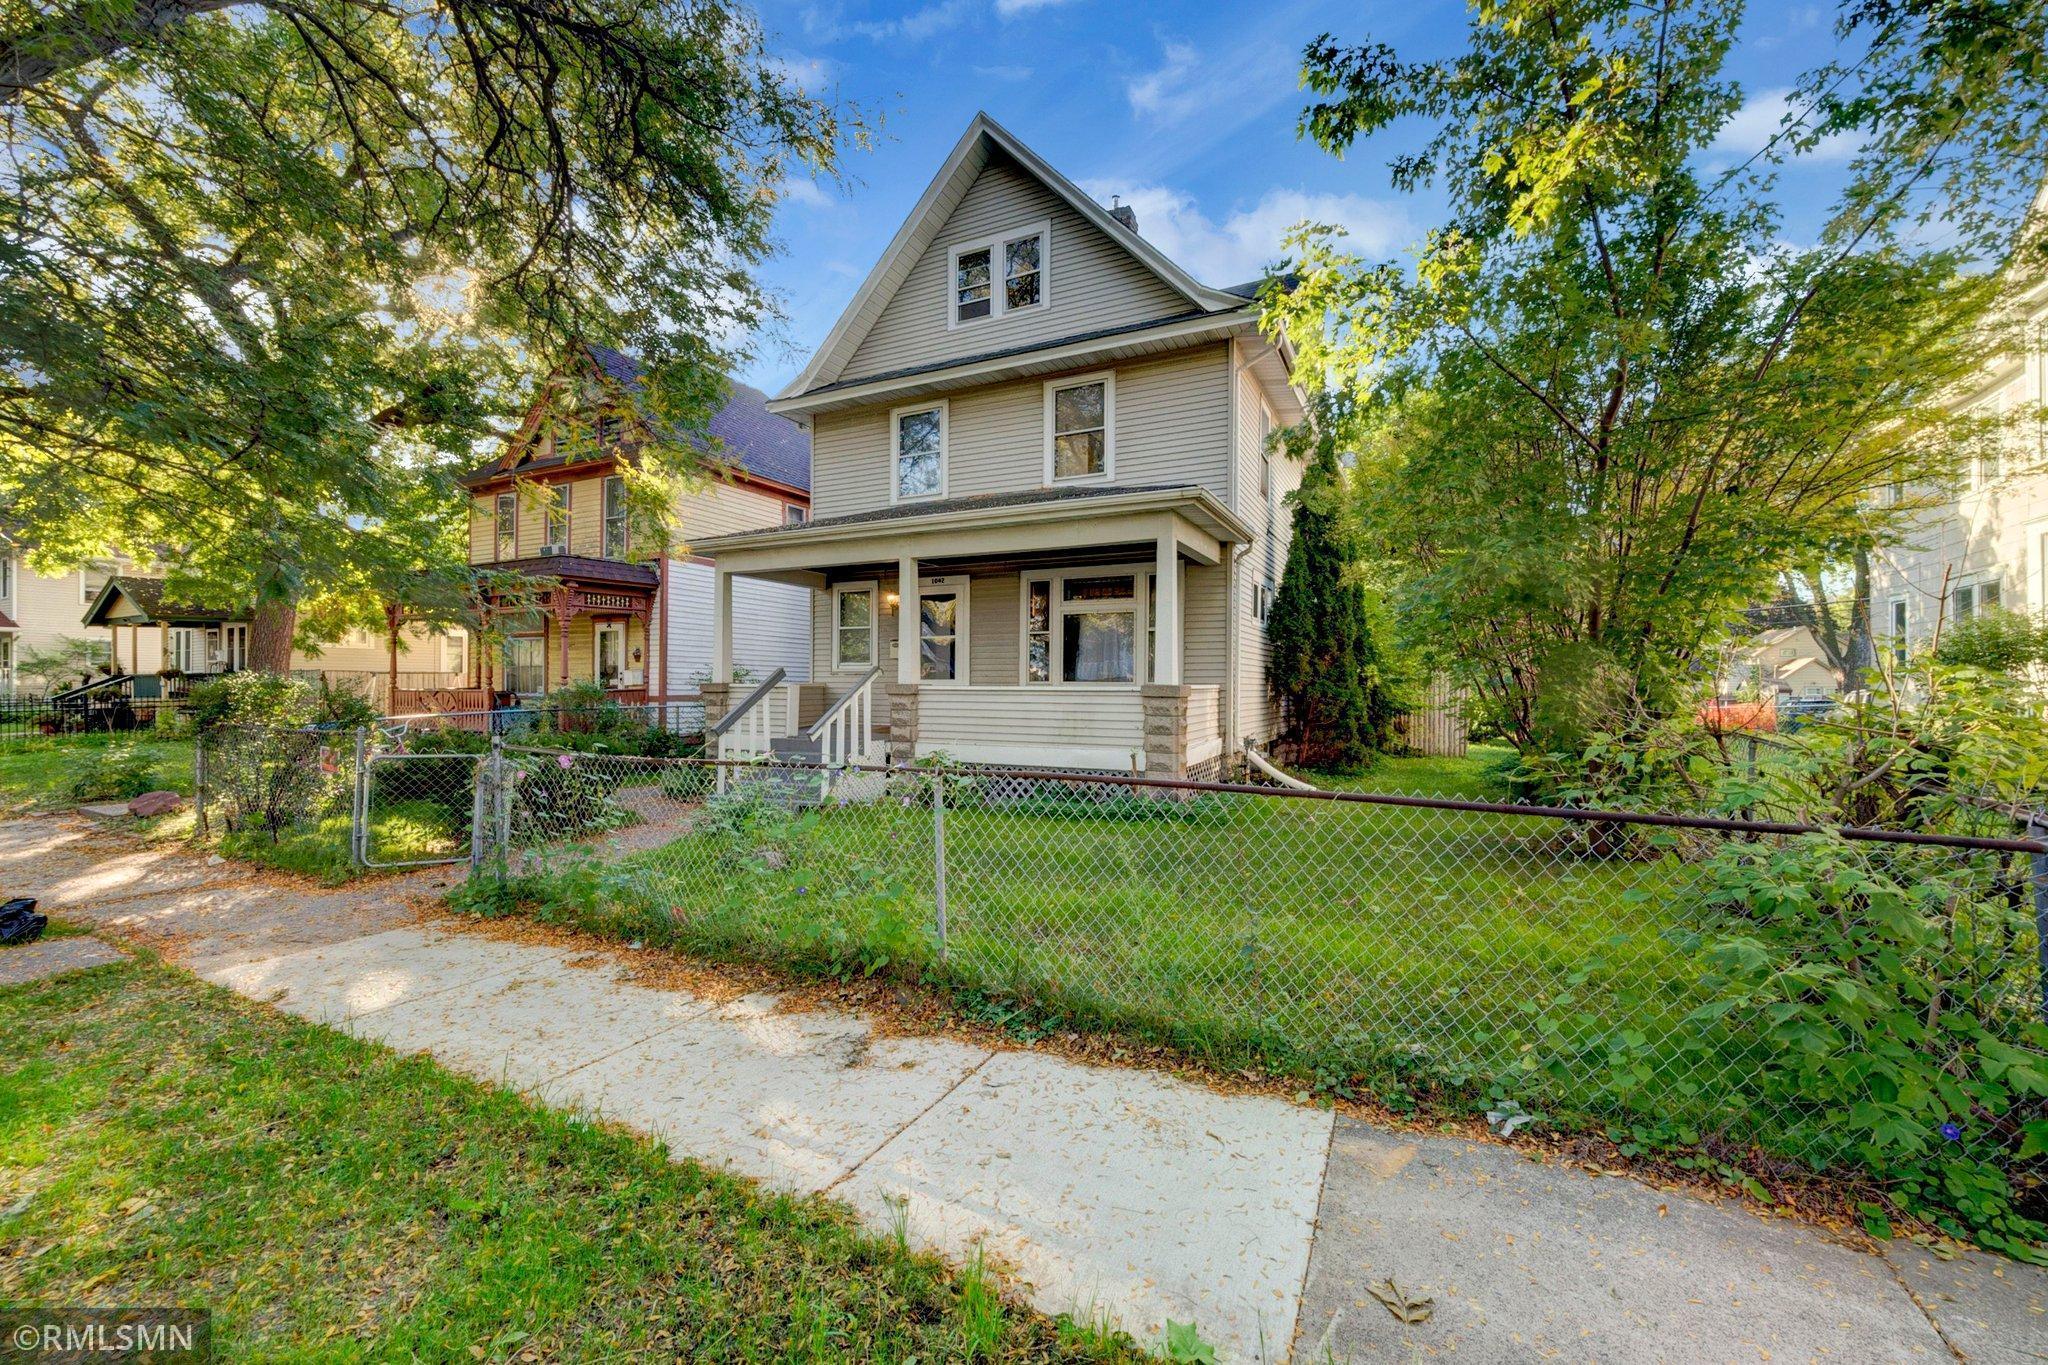 1042 Reaney Avenue, Saint Paul, Minnesota 55106, 4 Bedrooms Bedrooms, ,1 BathroomBathrooms,Residential,For Sale,Reaney,NST6114171